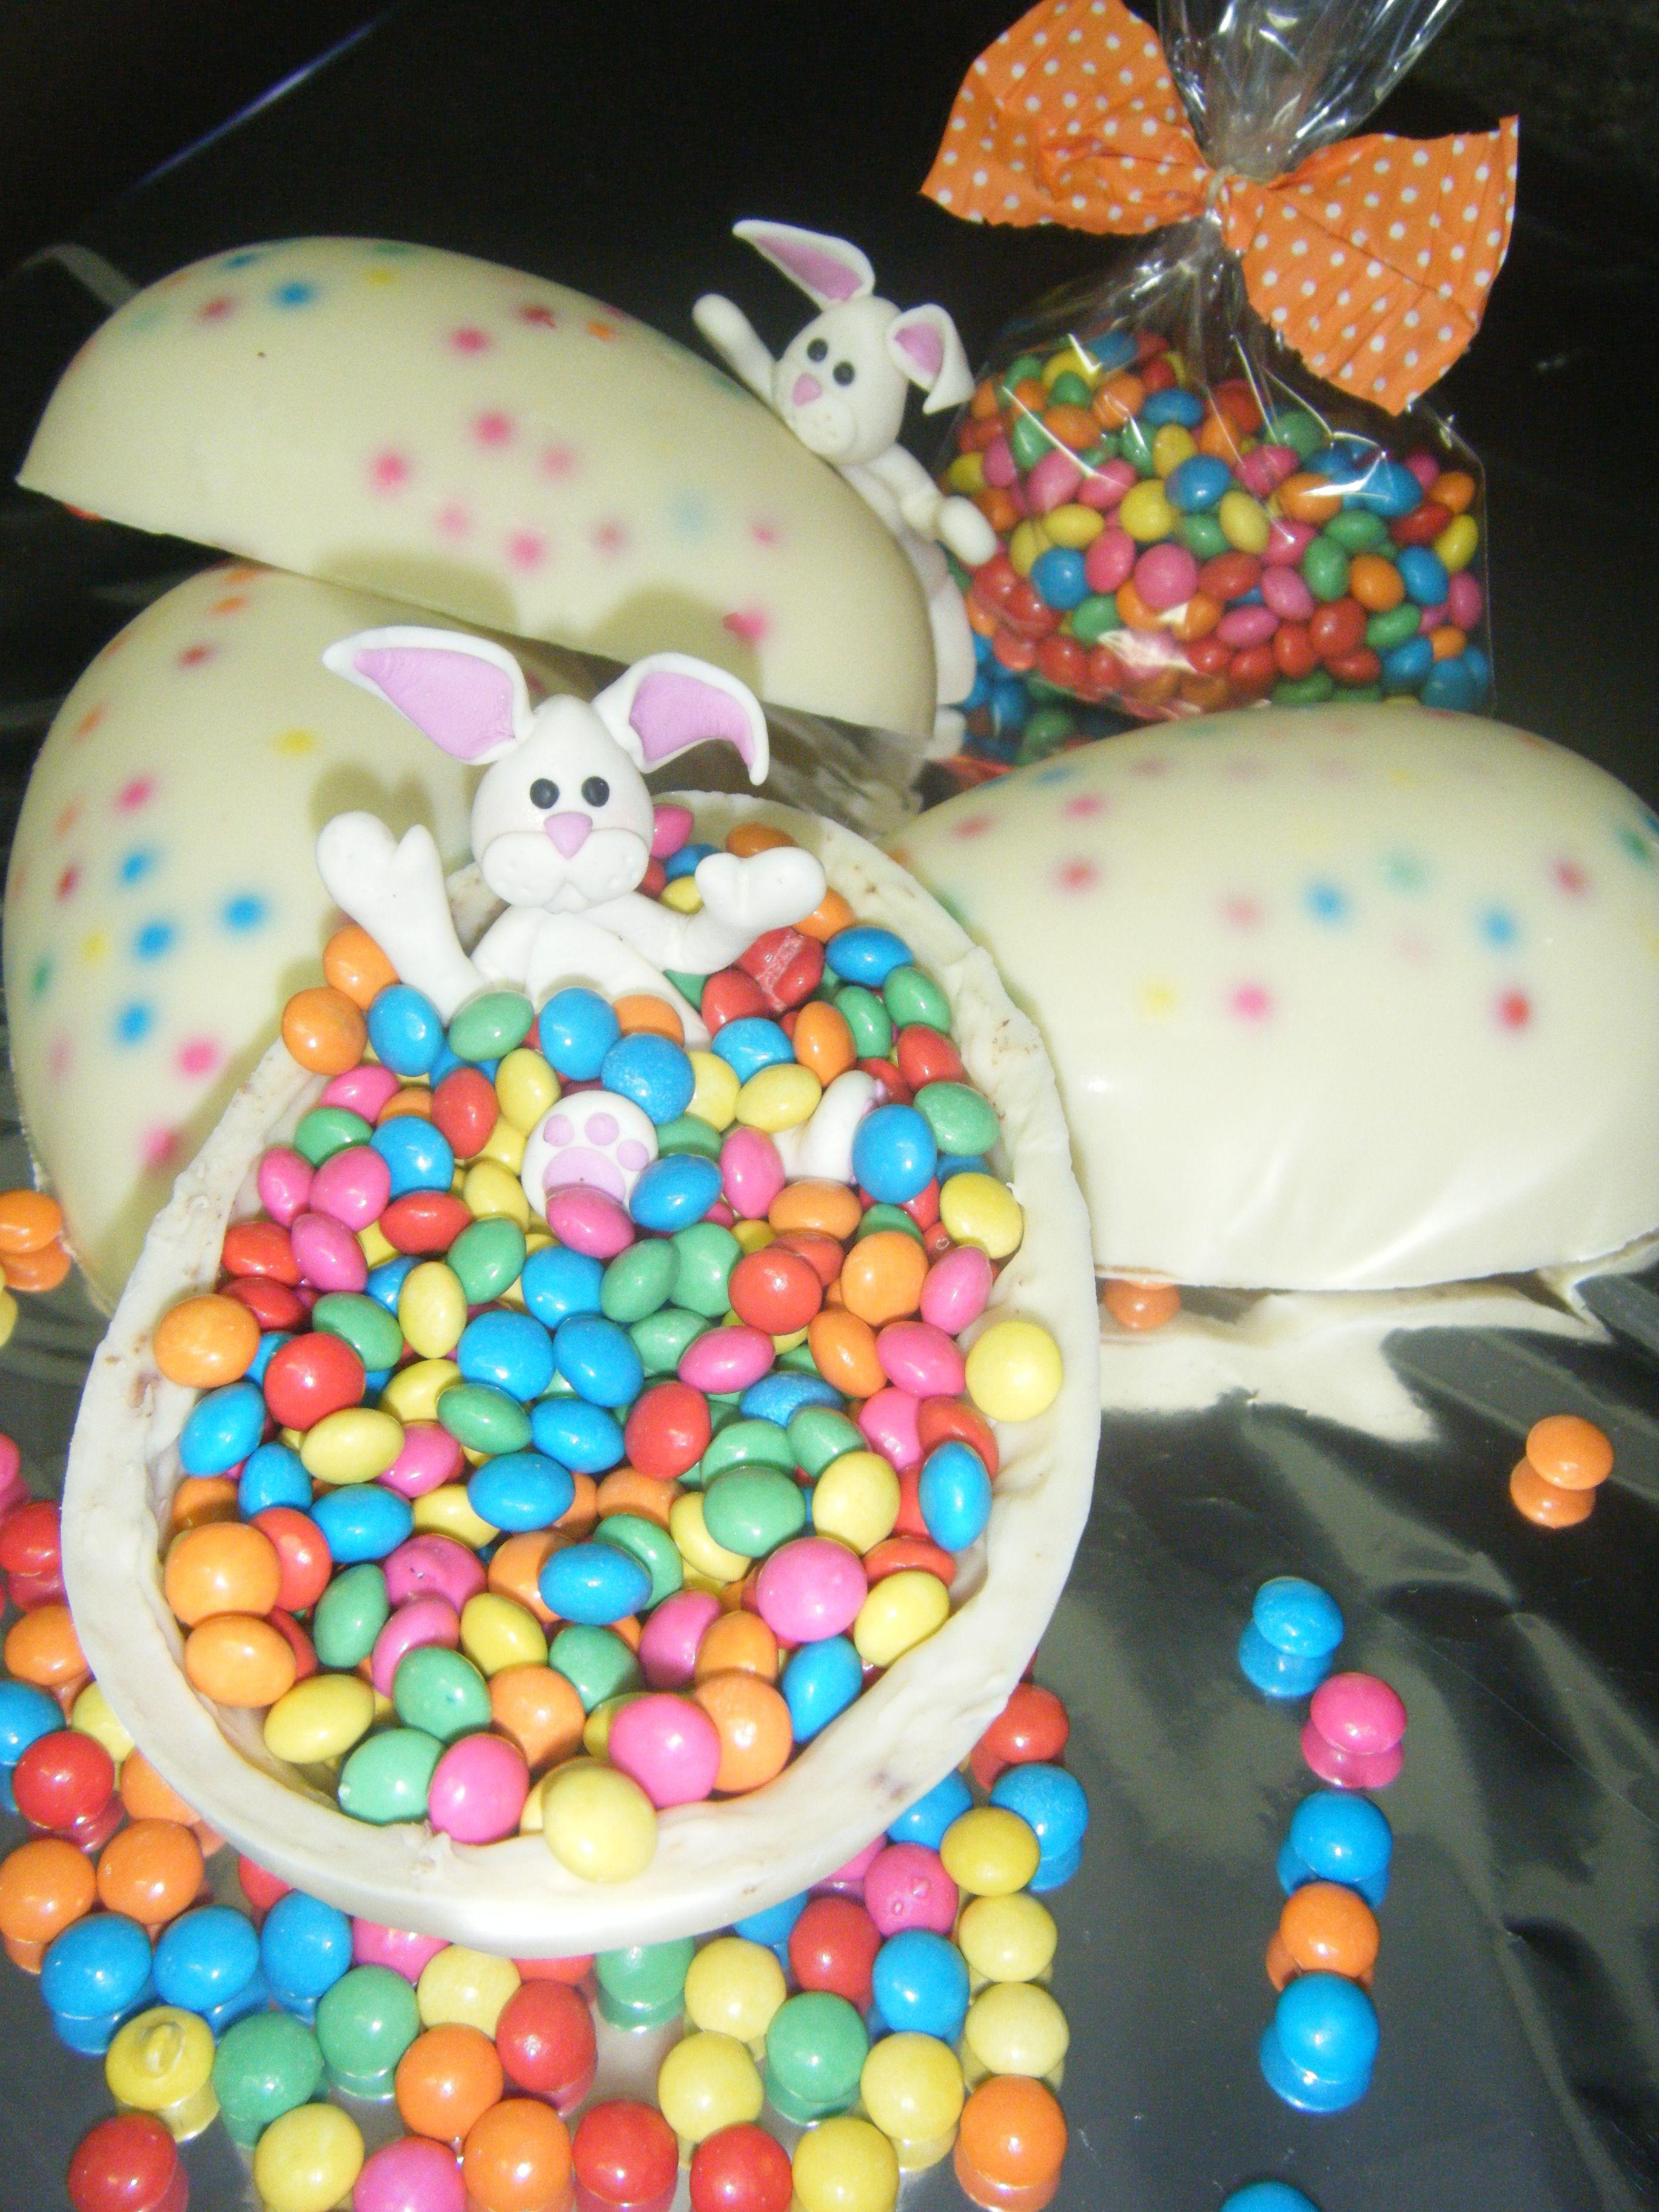 white chocolate with confetti